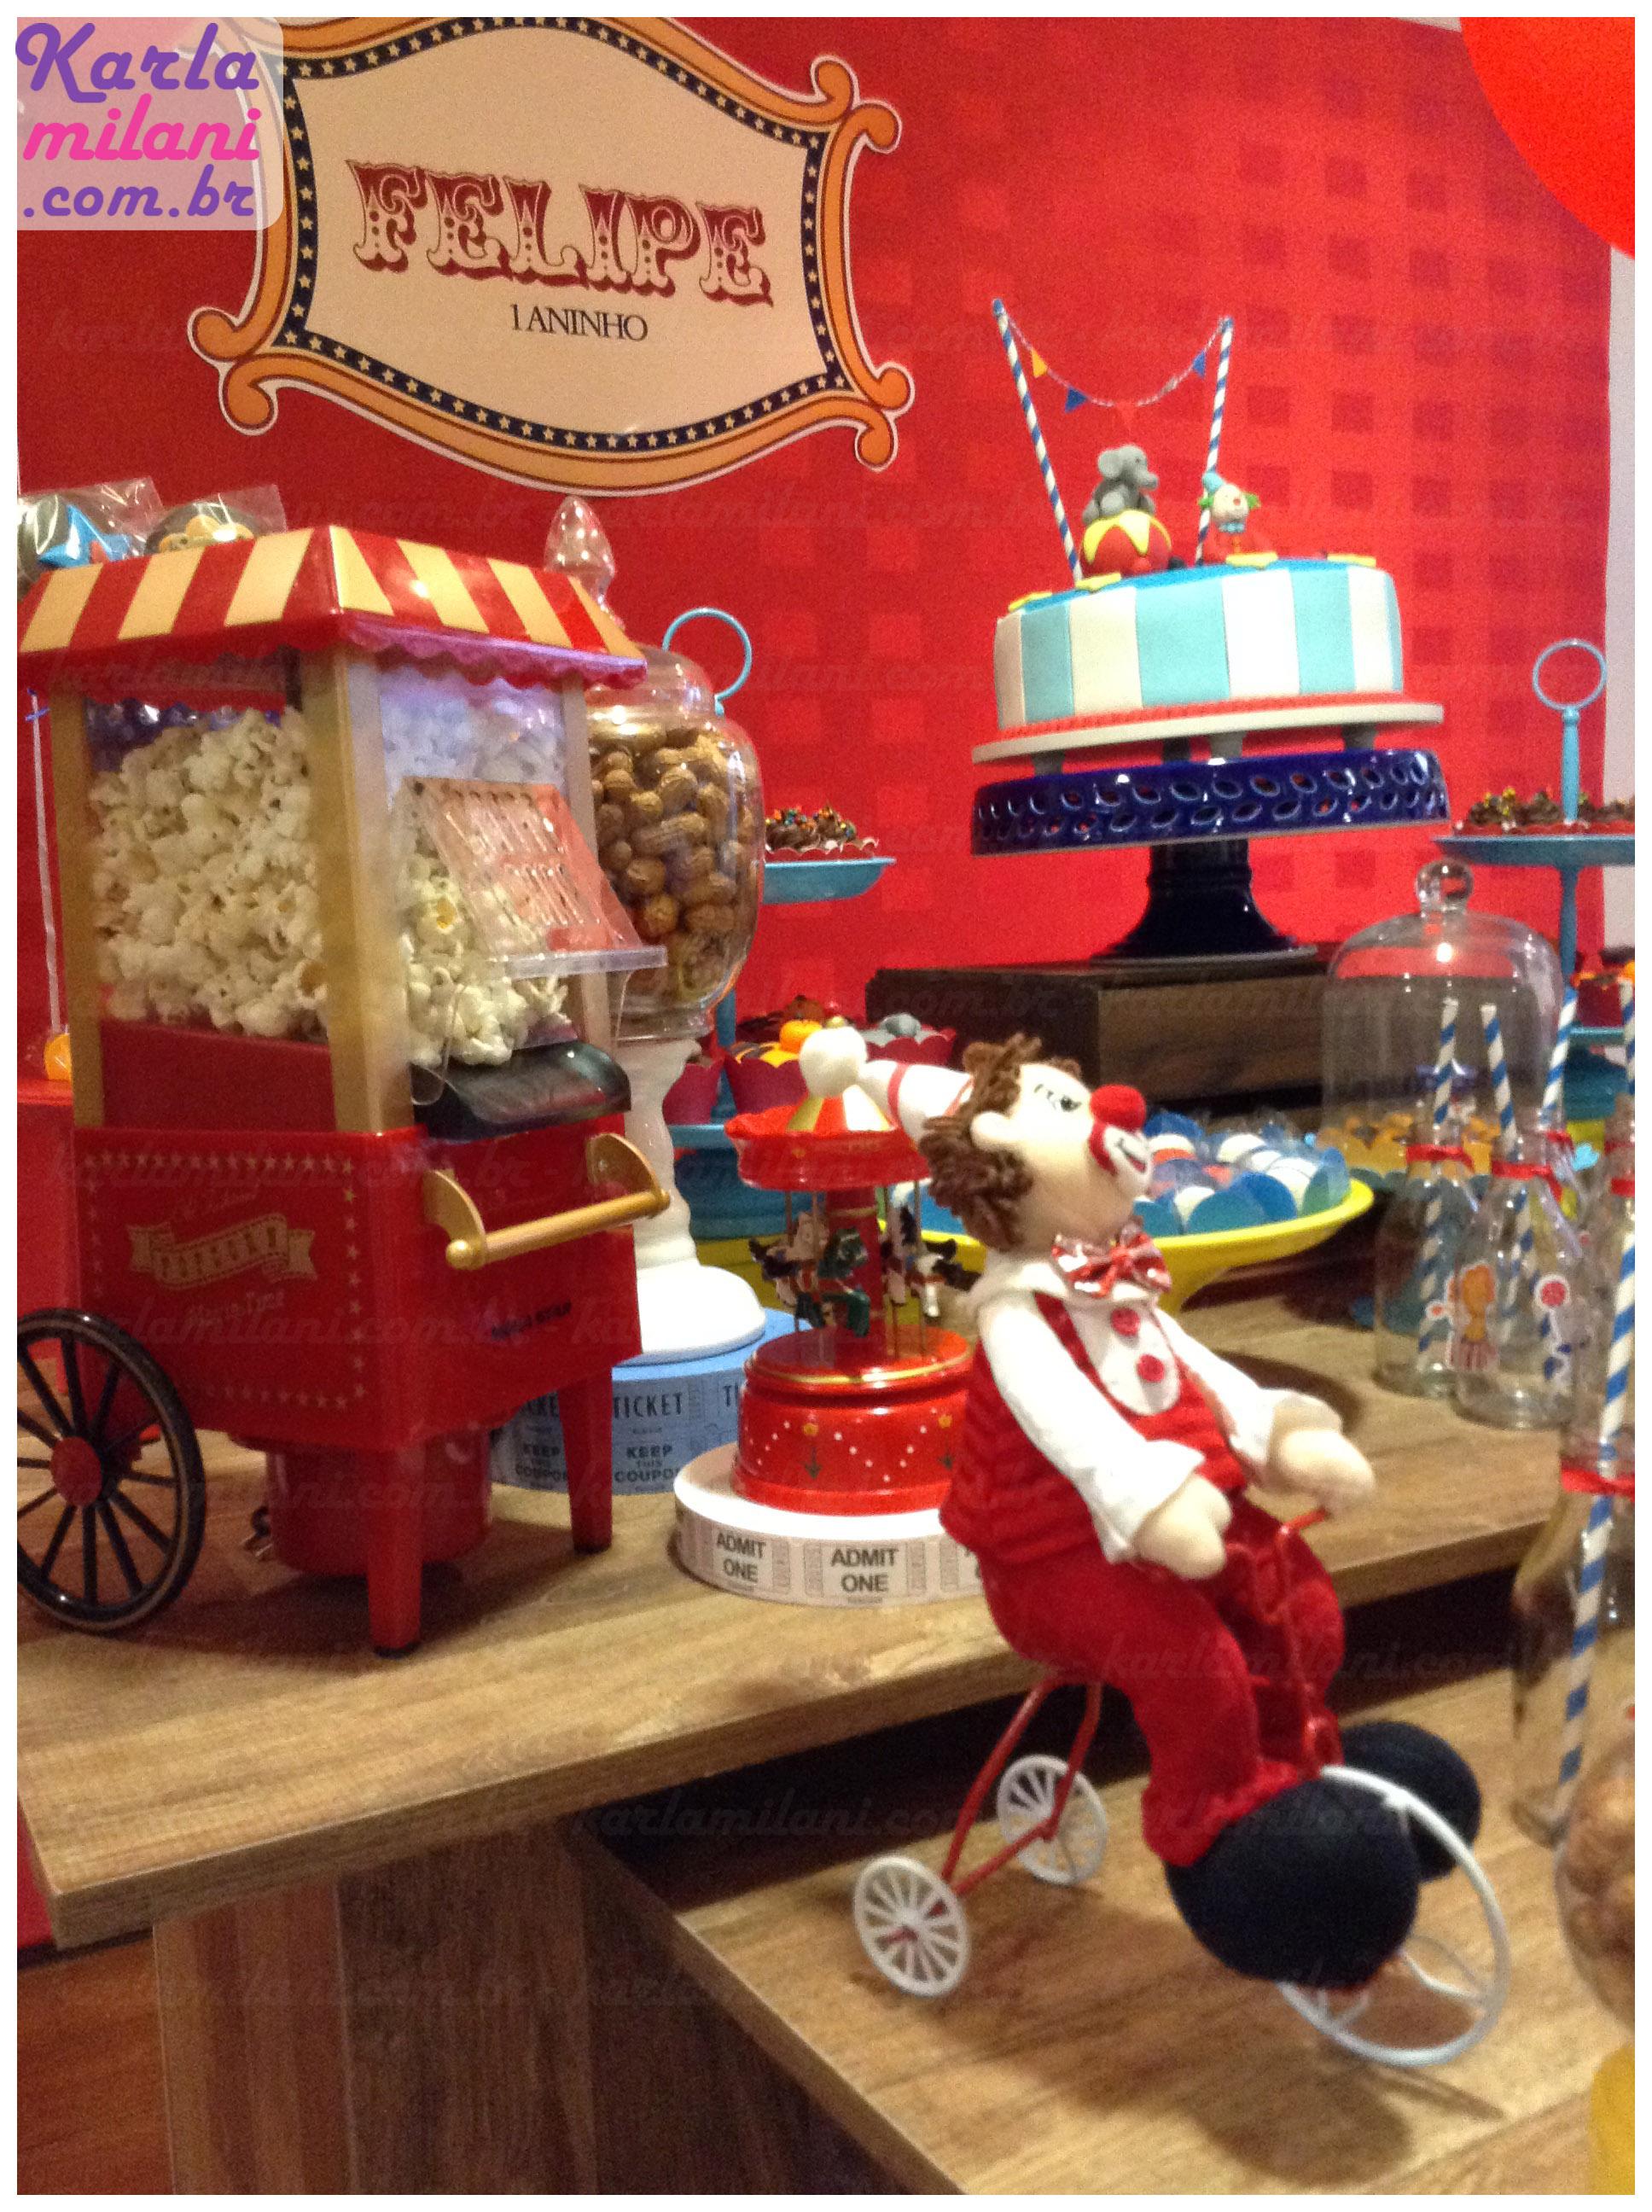 decoracao festa retro : decoracao festa retro: vintage decoracao de festa circo circo decoracao de festa circo festa